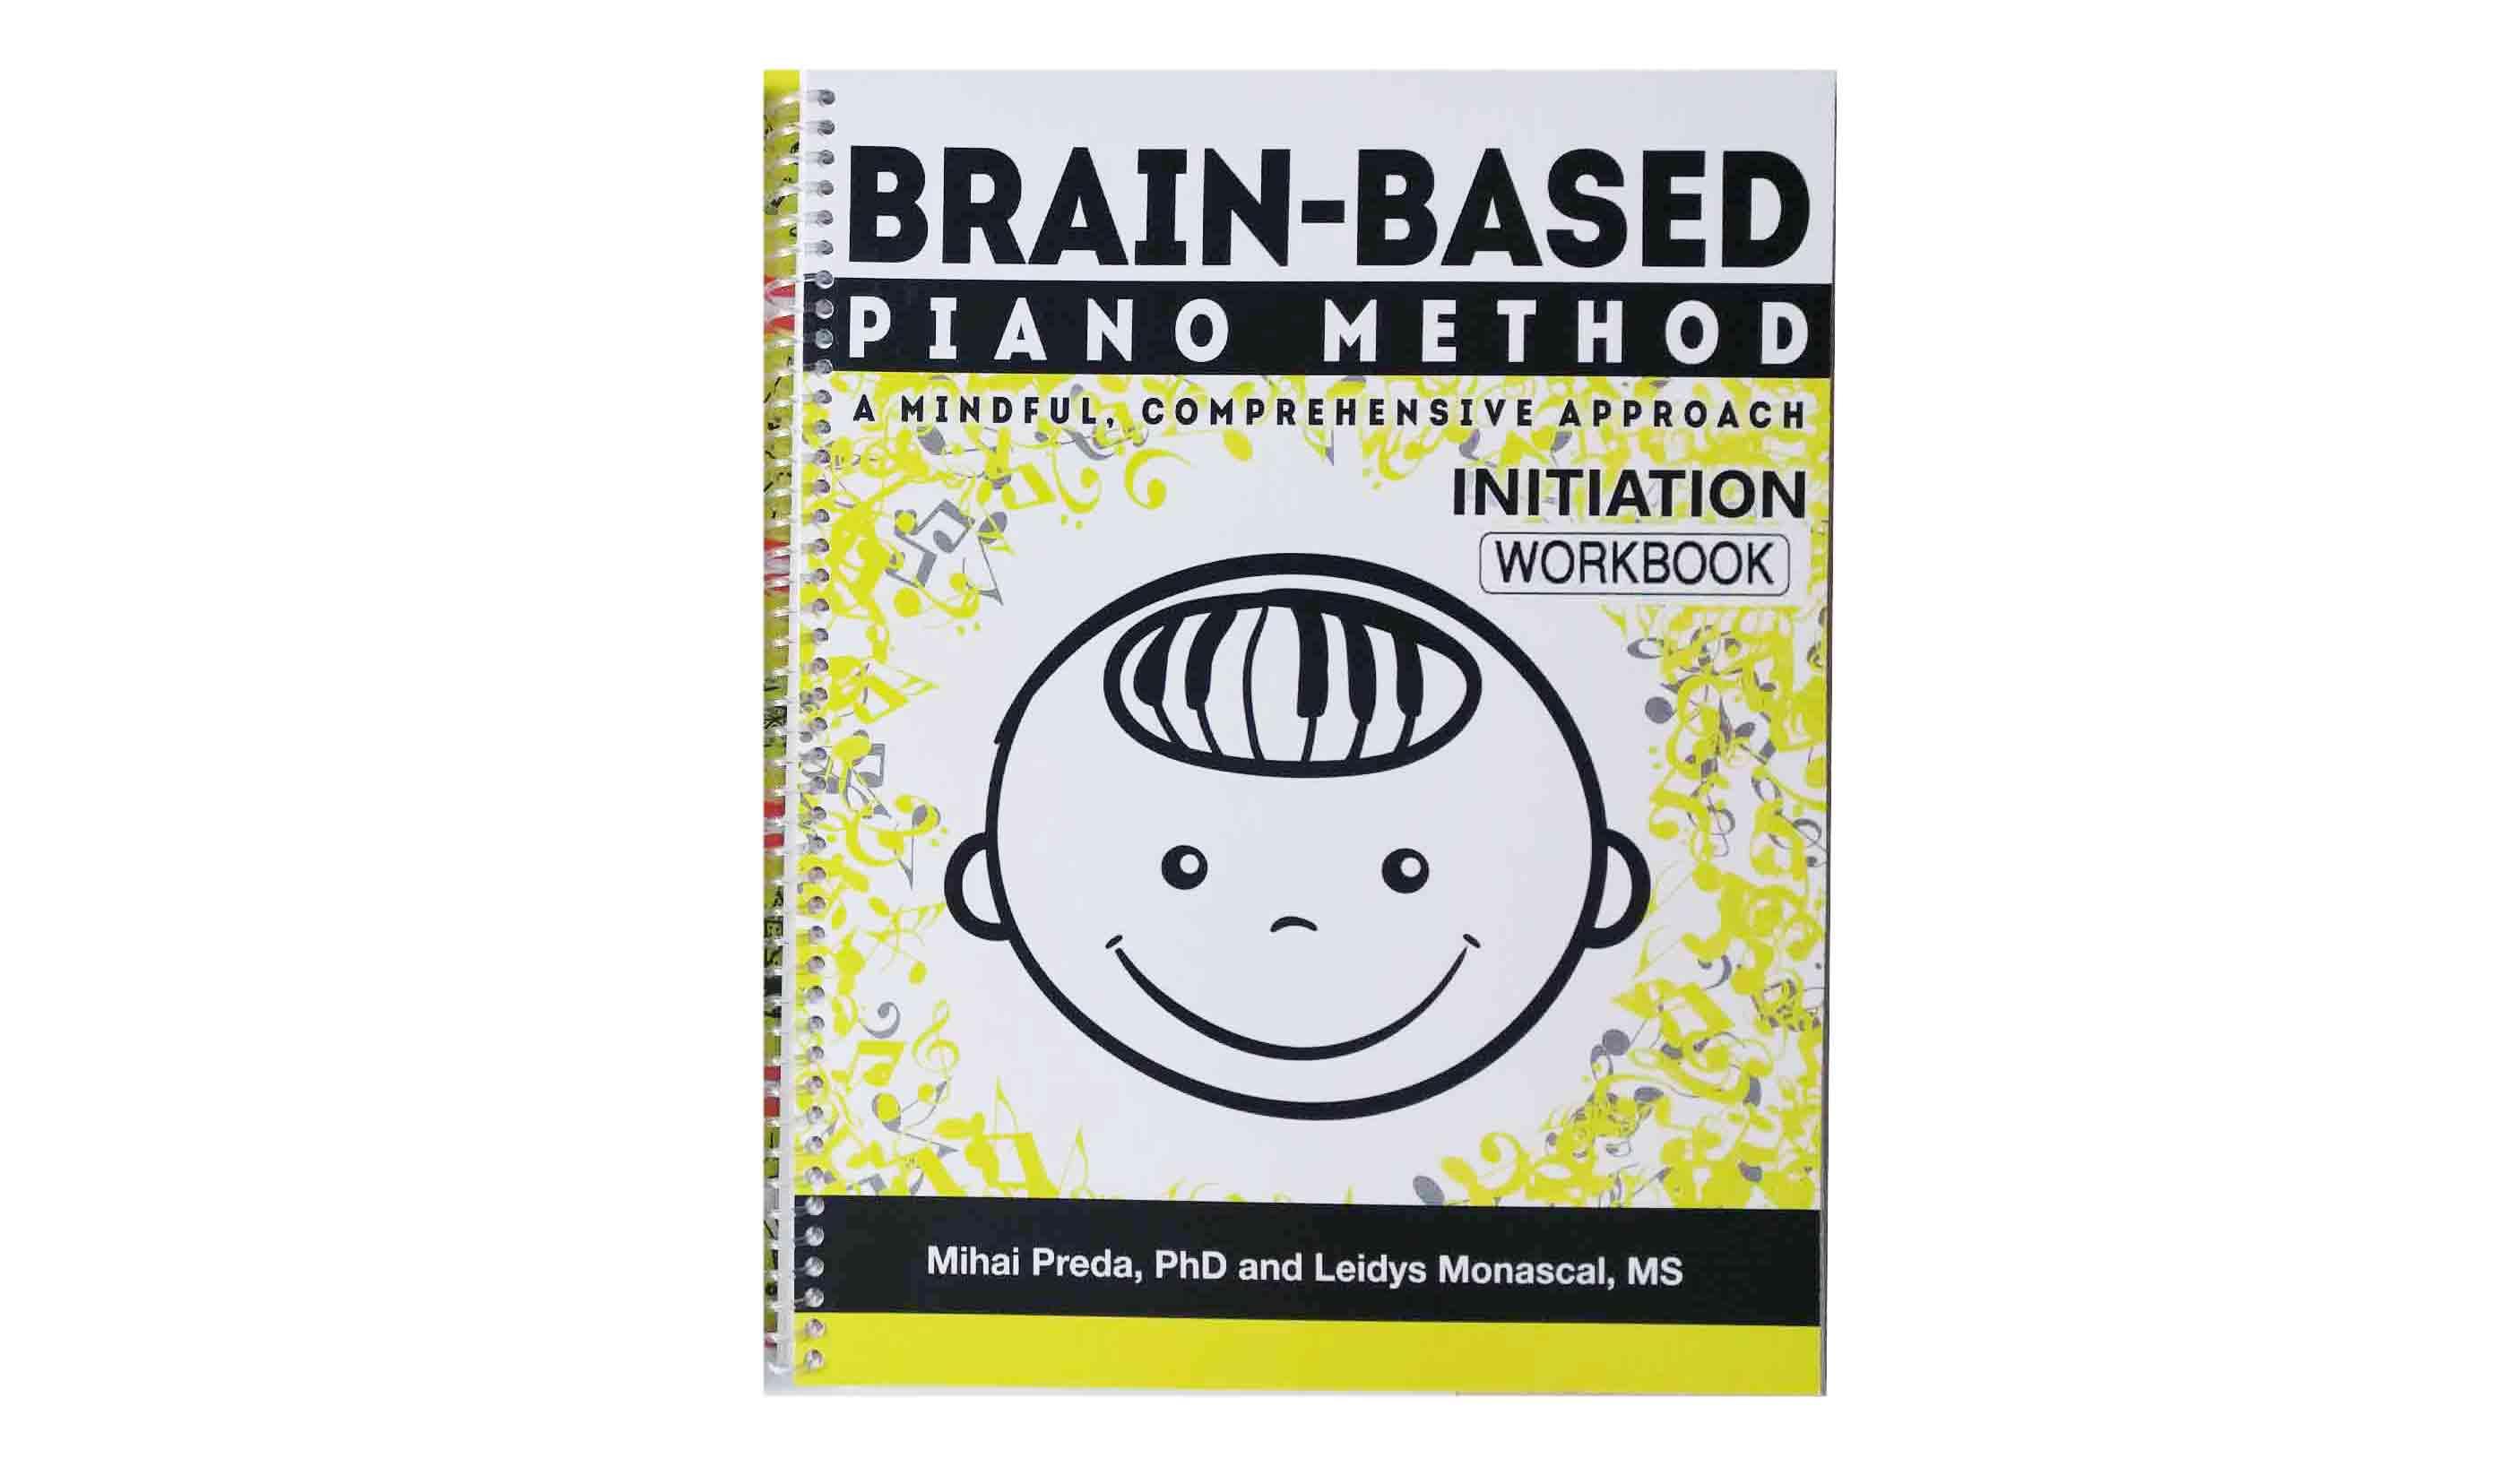 Initiation Workbook